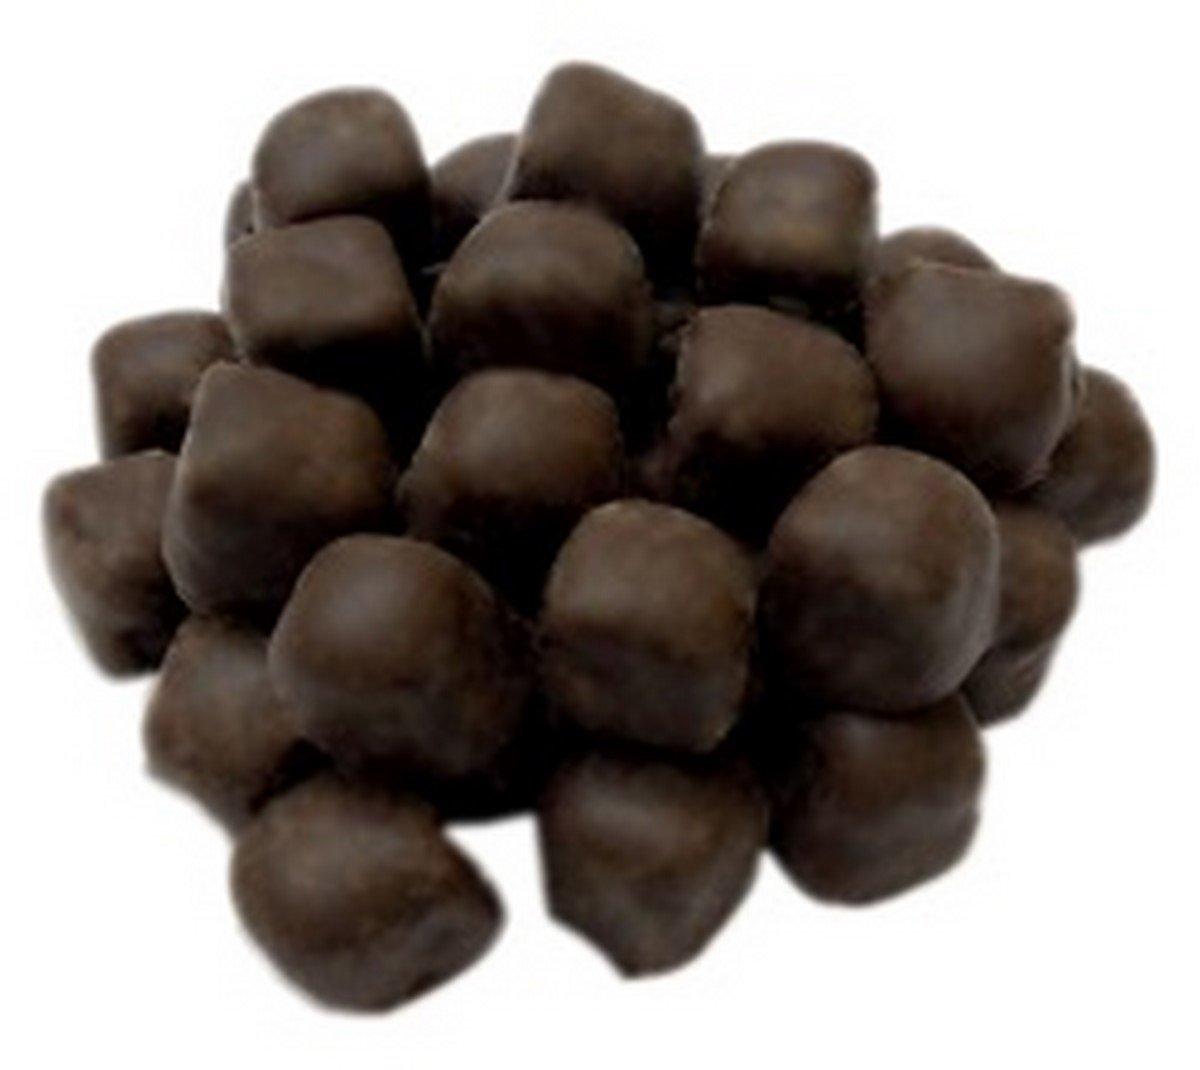 Sunridge Farms, All Natural Chocolate Coconut Chews, Pack of 10, Size - #, Quantity - 1 Case